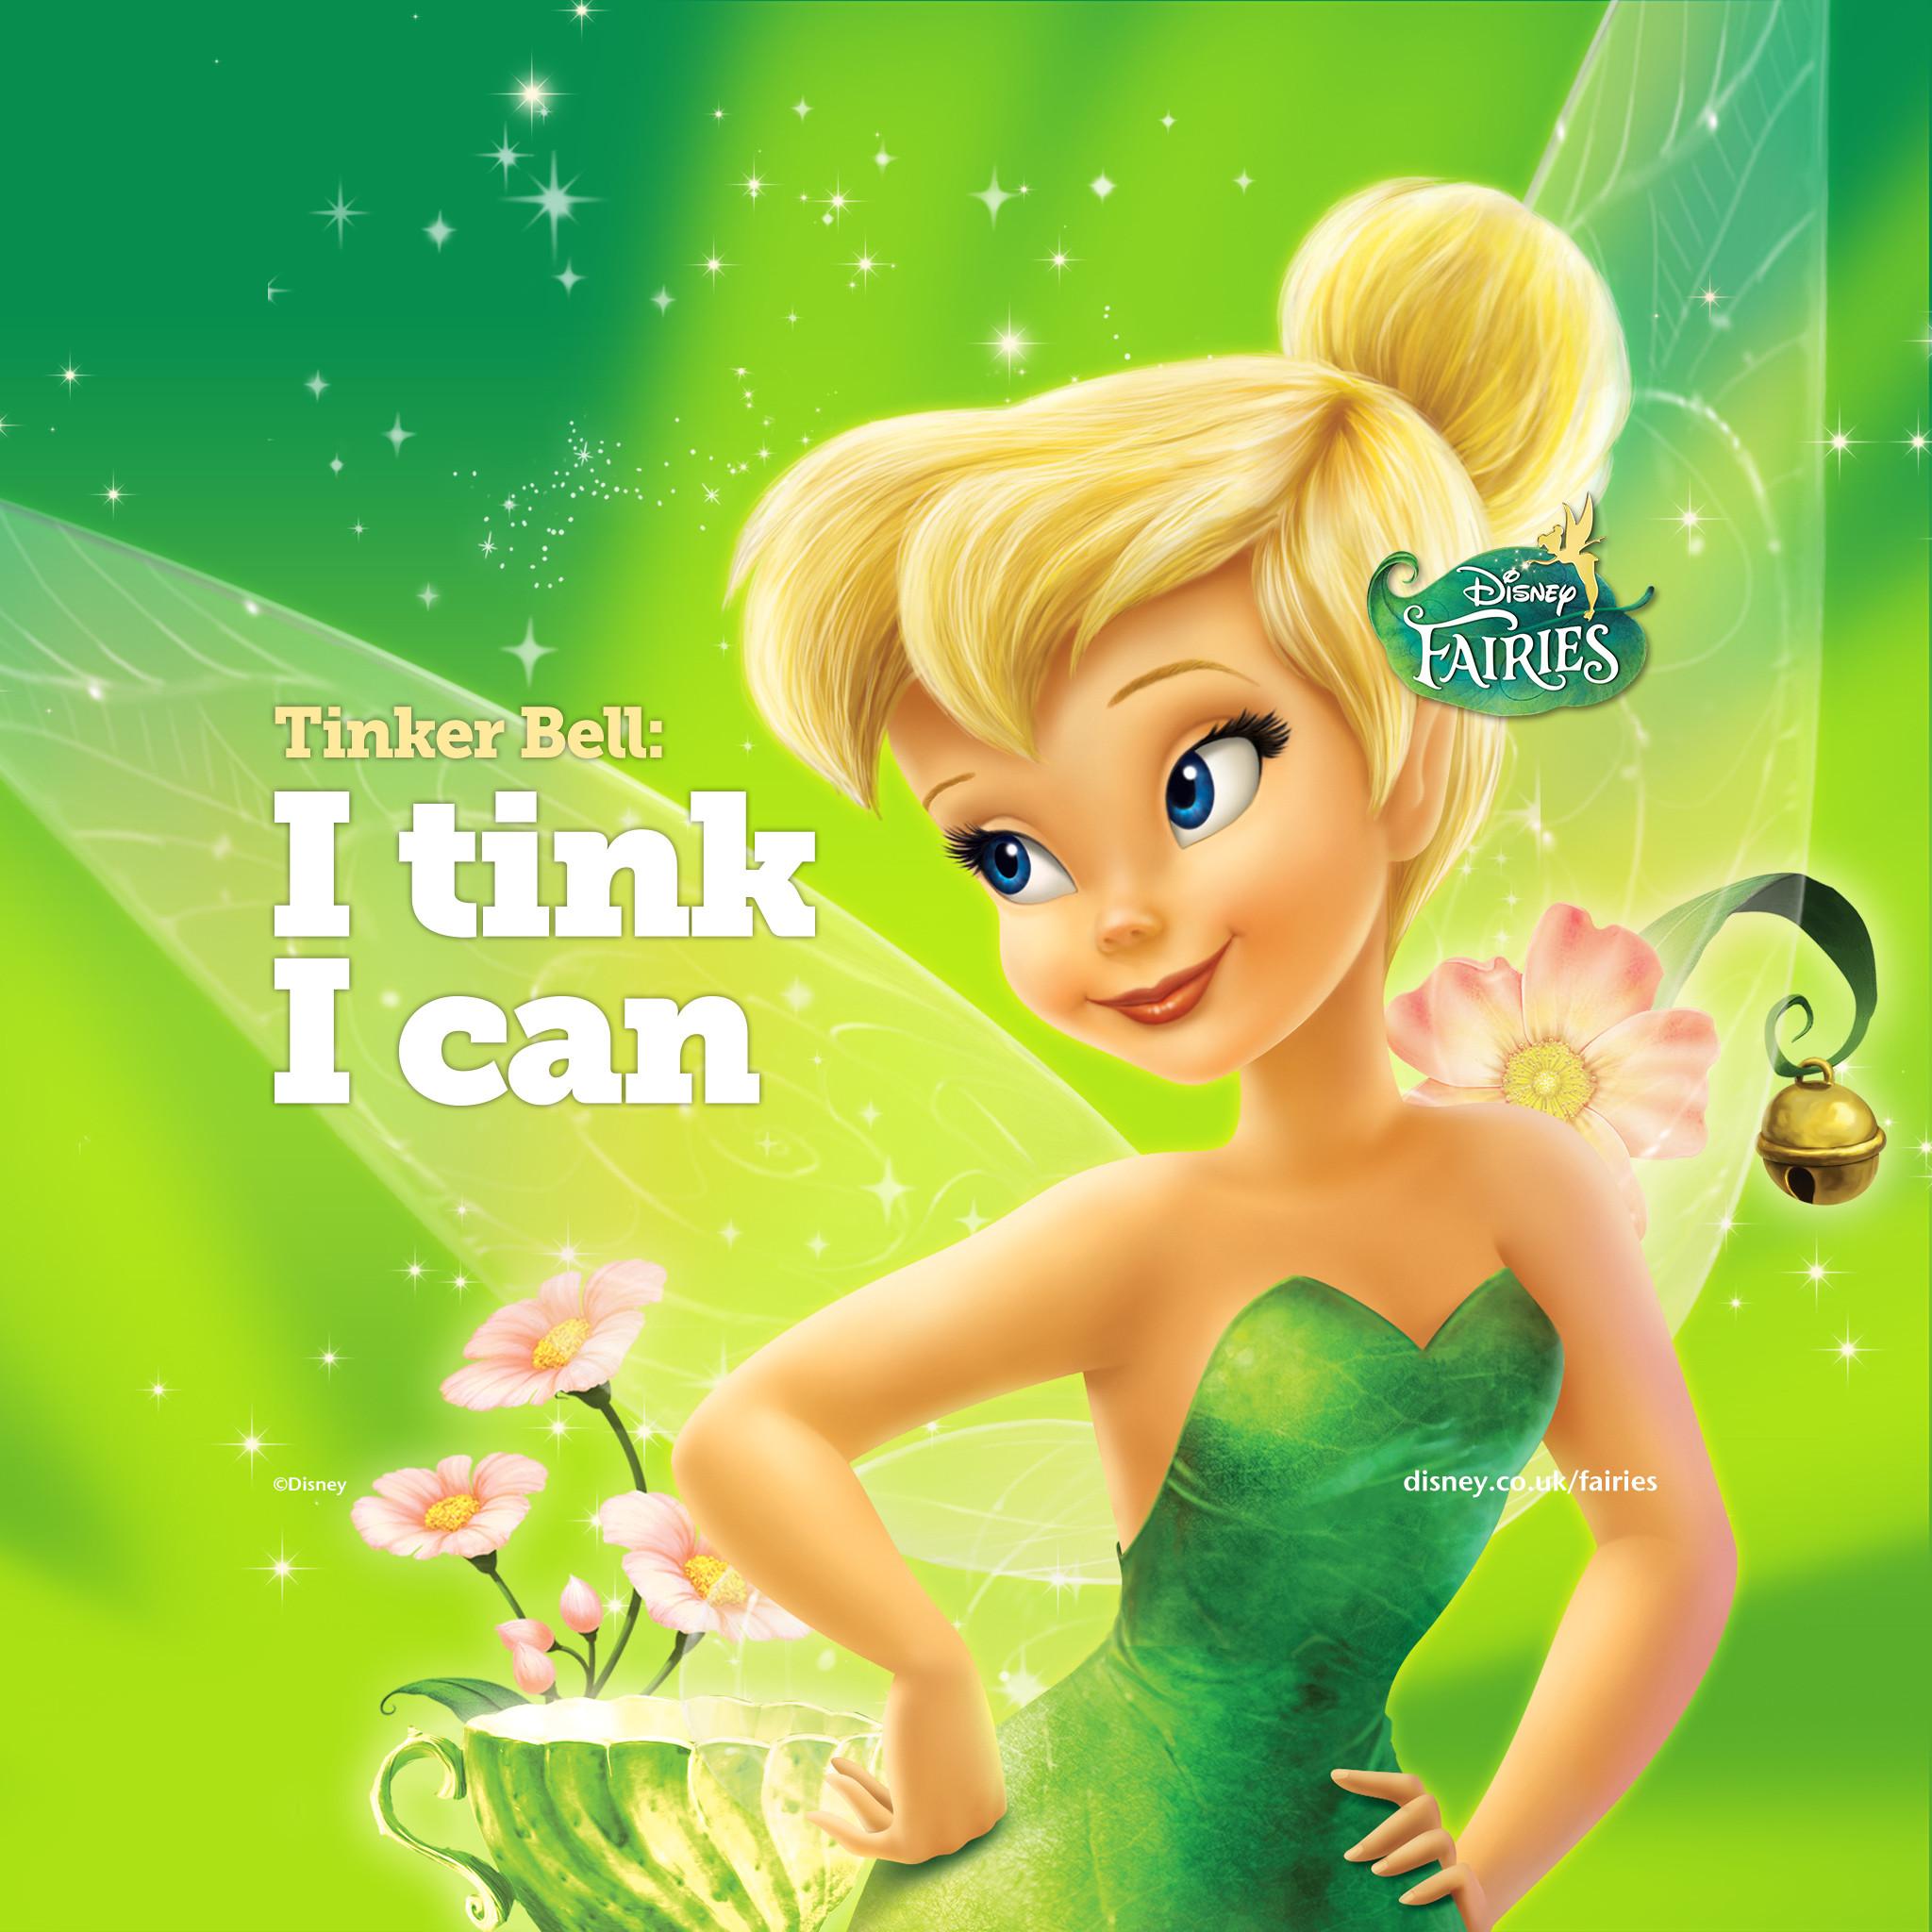 Disney Fairies Tinkerbell Tink | Tinker Bell iPad